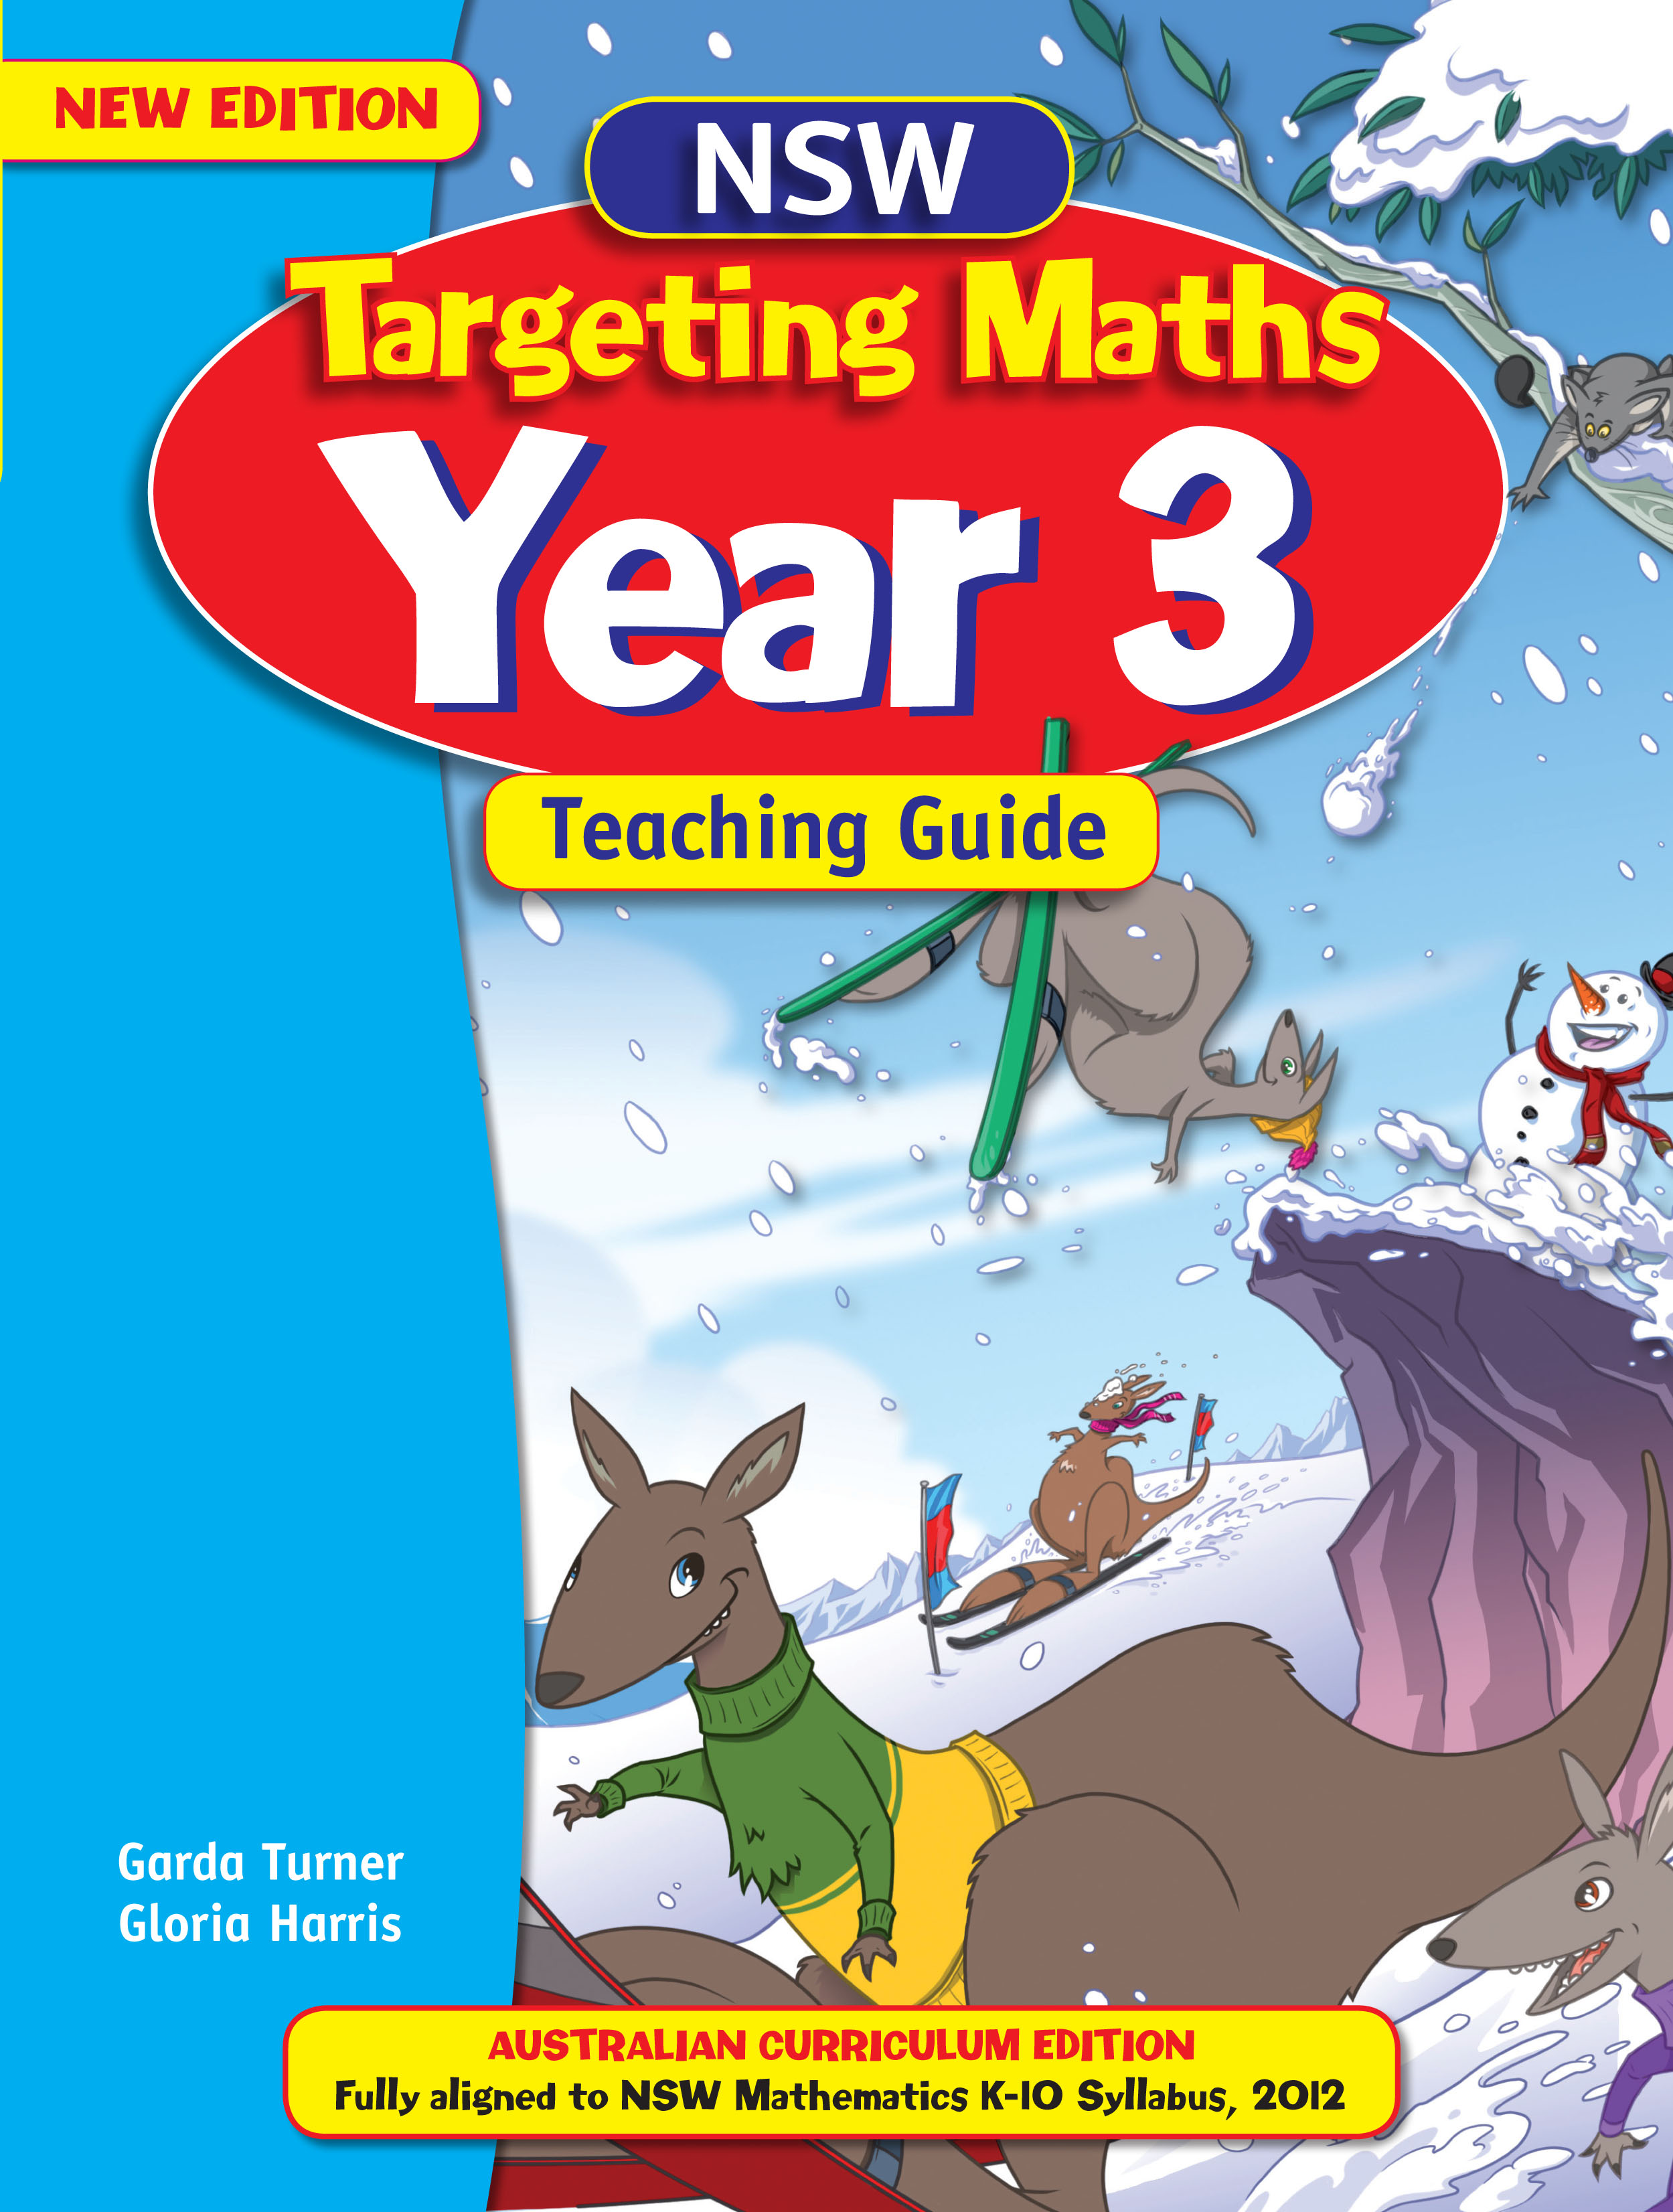 NSW Targeting Maths Australian Curriculum Teaching Guide Year 3